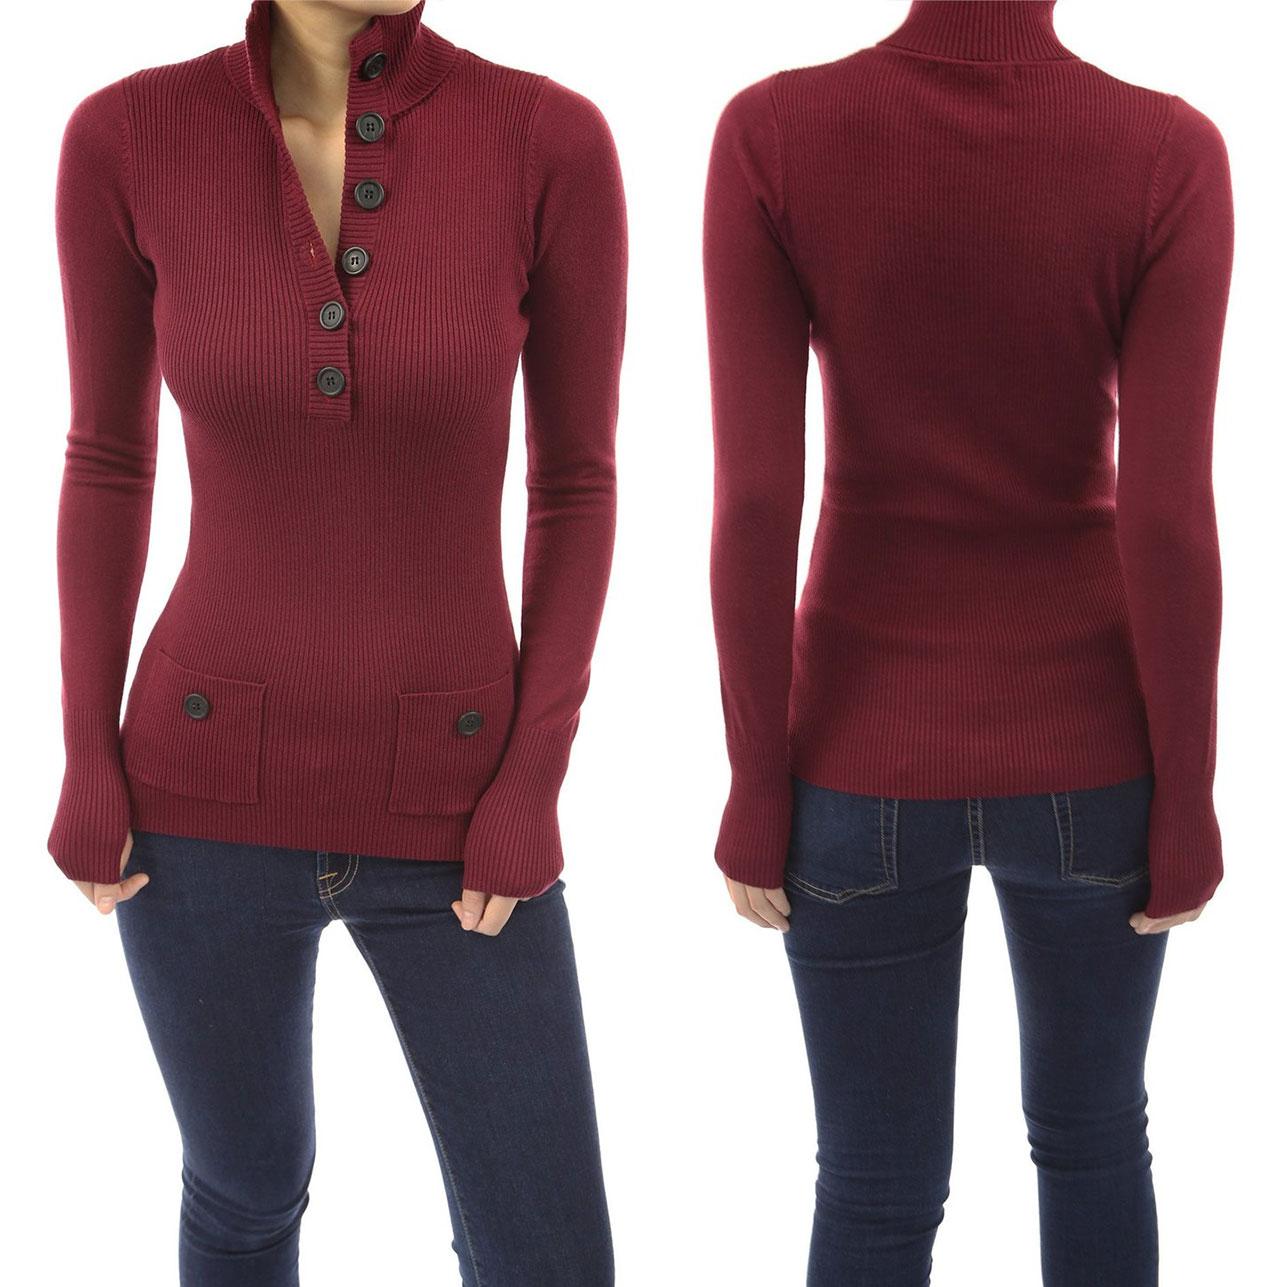 V-Neck Buttondown Sweater by PattyBoutik